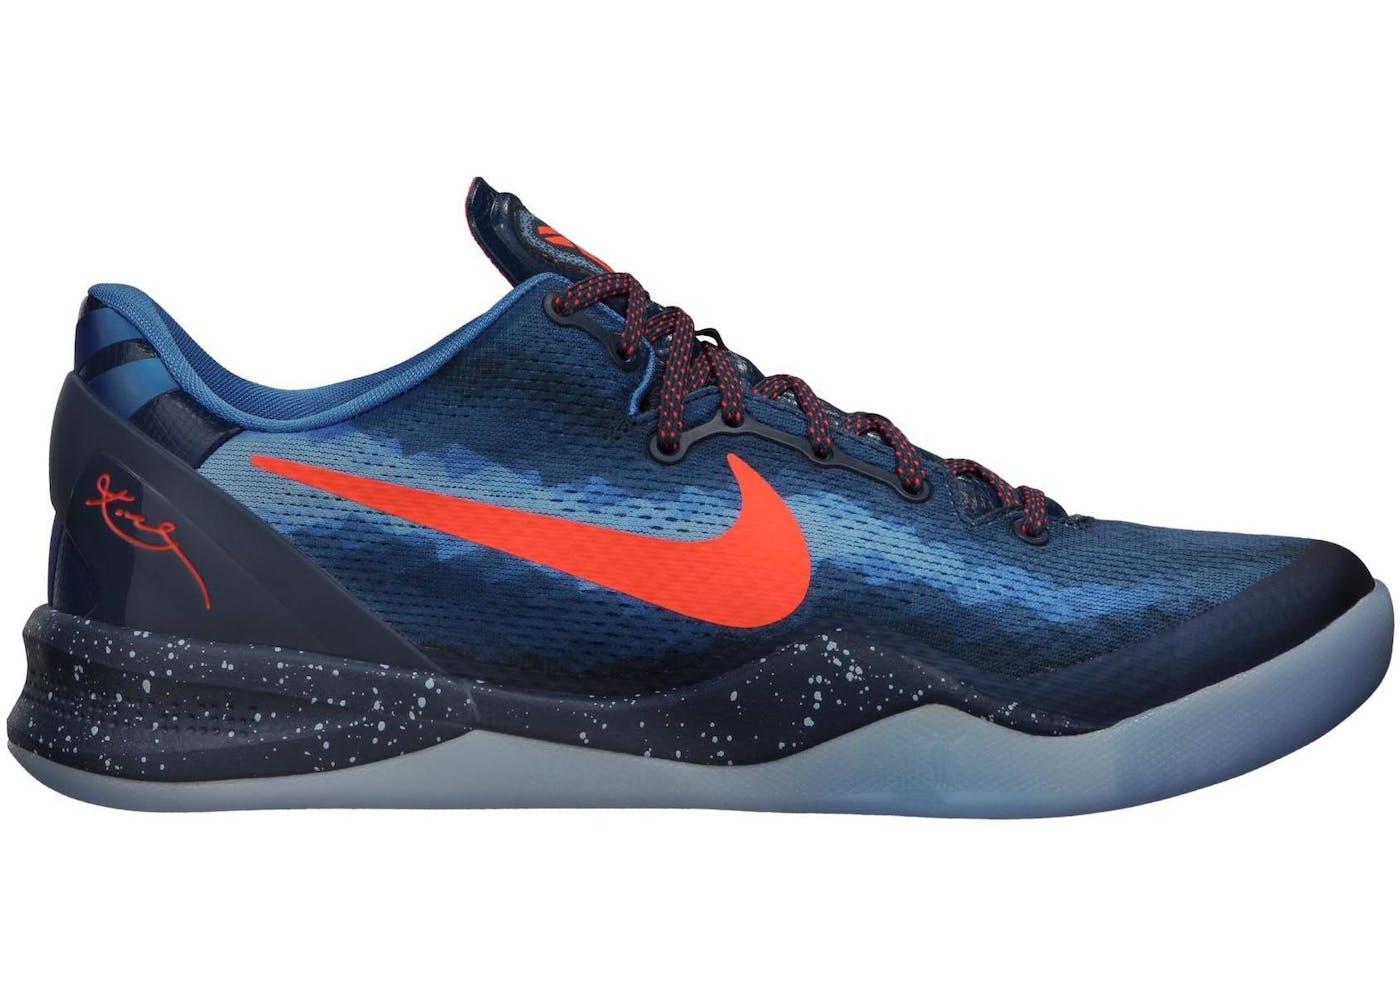 3cc067a470d9 ... Kobe 8 Blue Blitz ... Shoes 555035-401 Nike ...